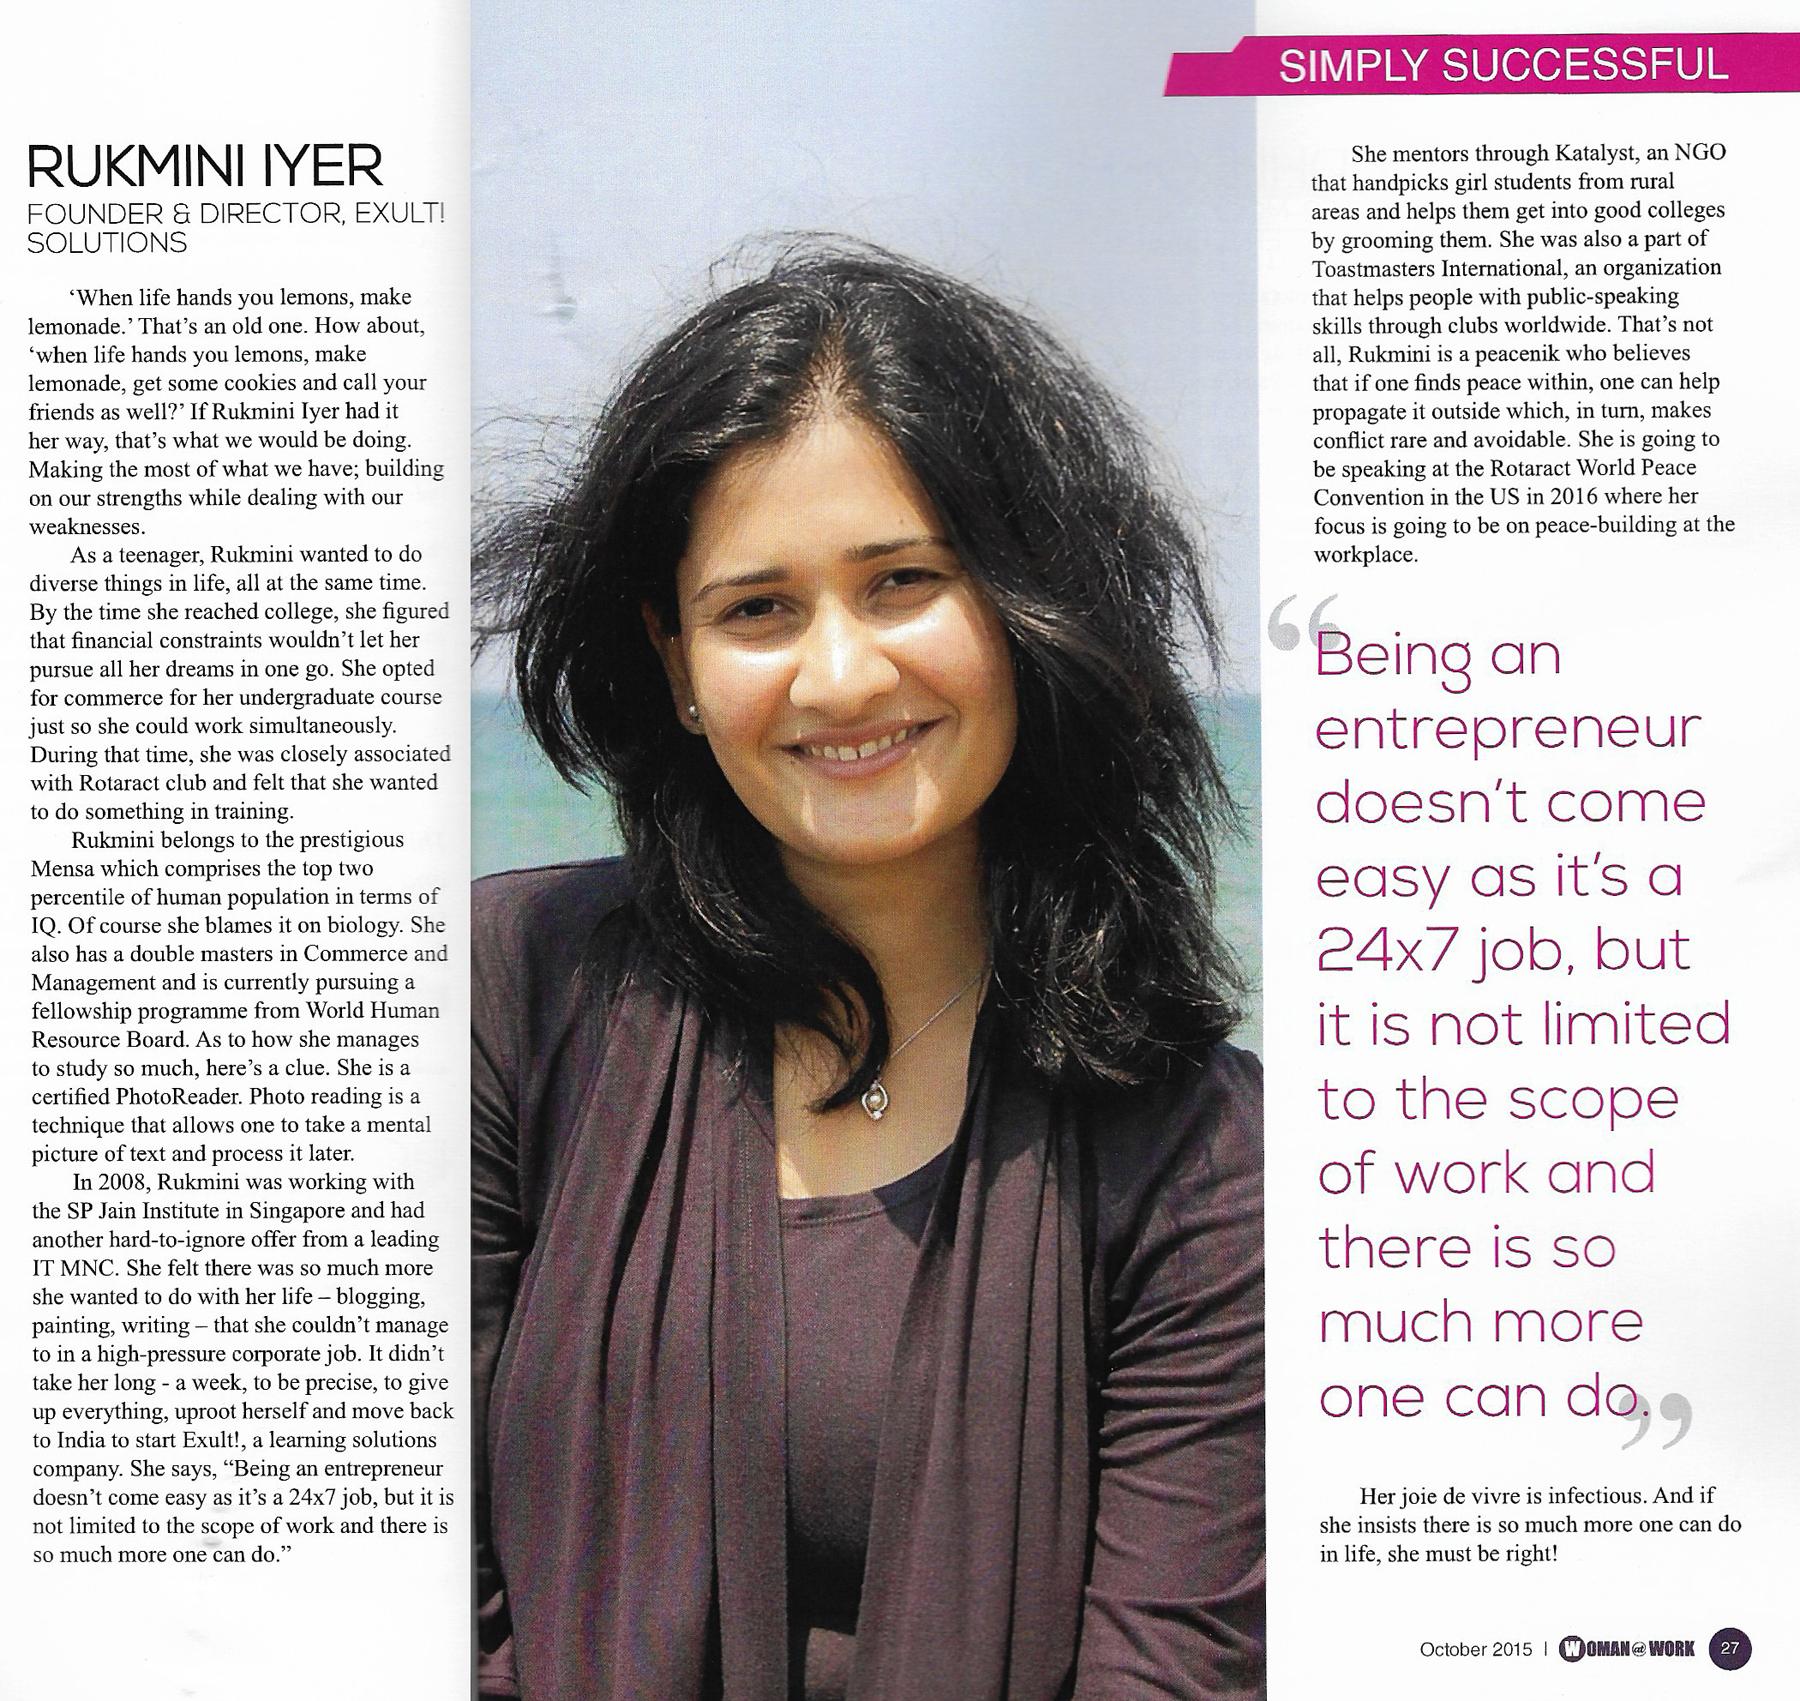 Woman at Work - Simply Successful - Rukmini Iyer